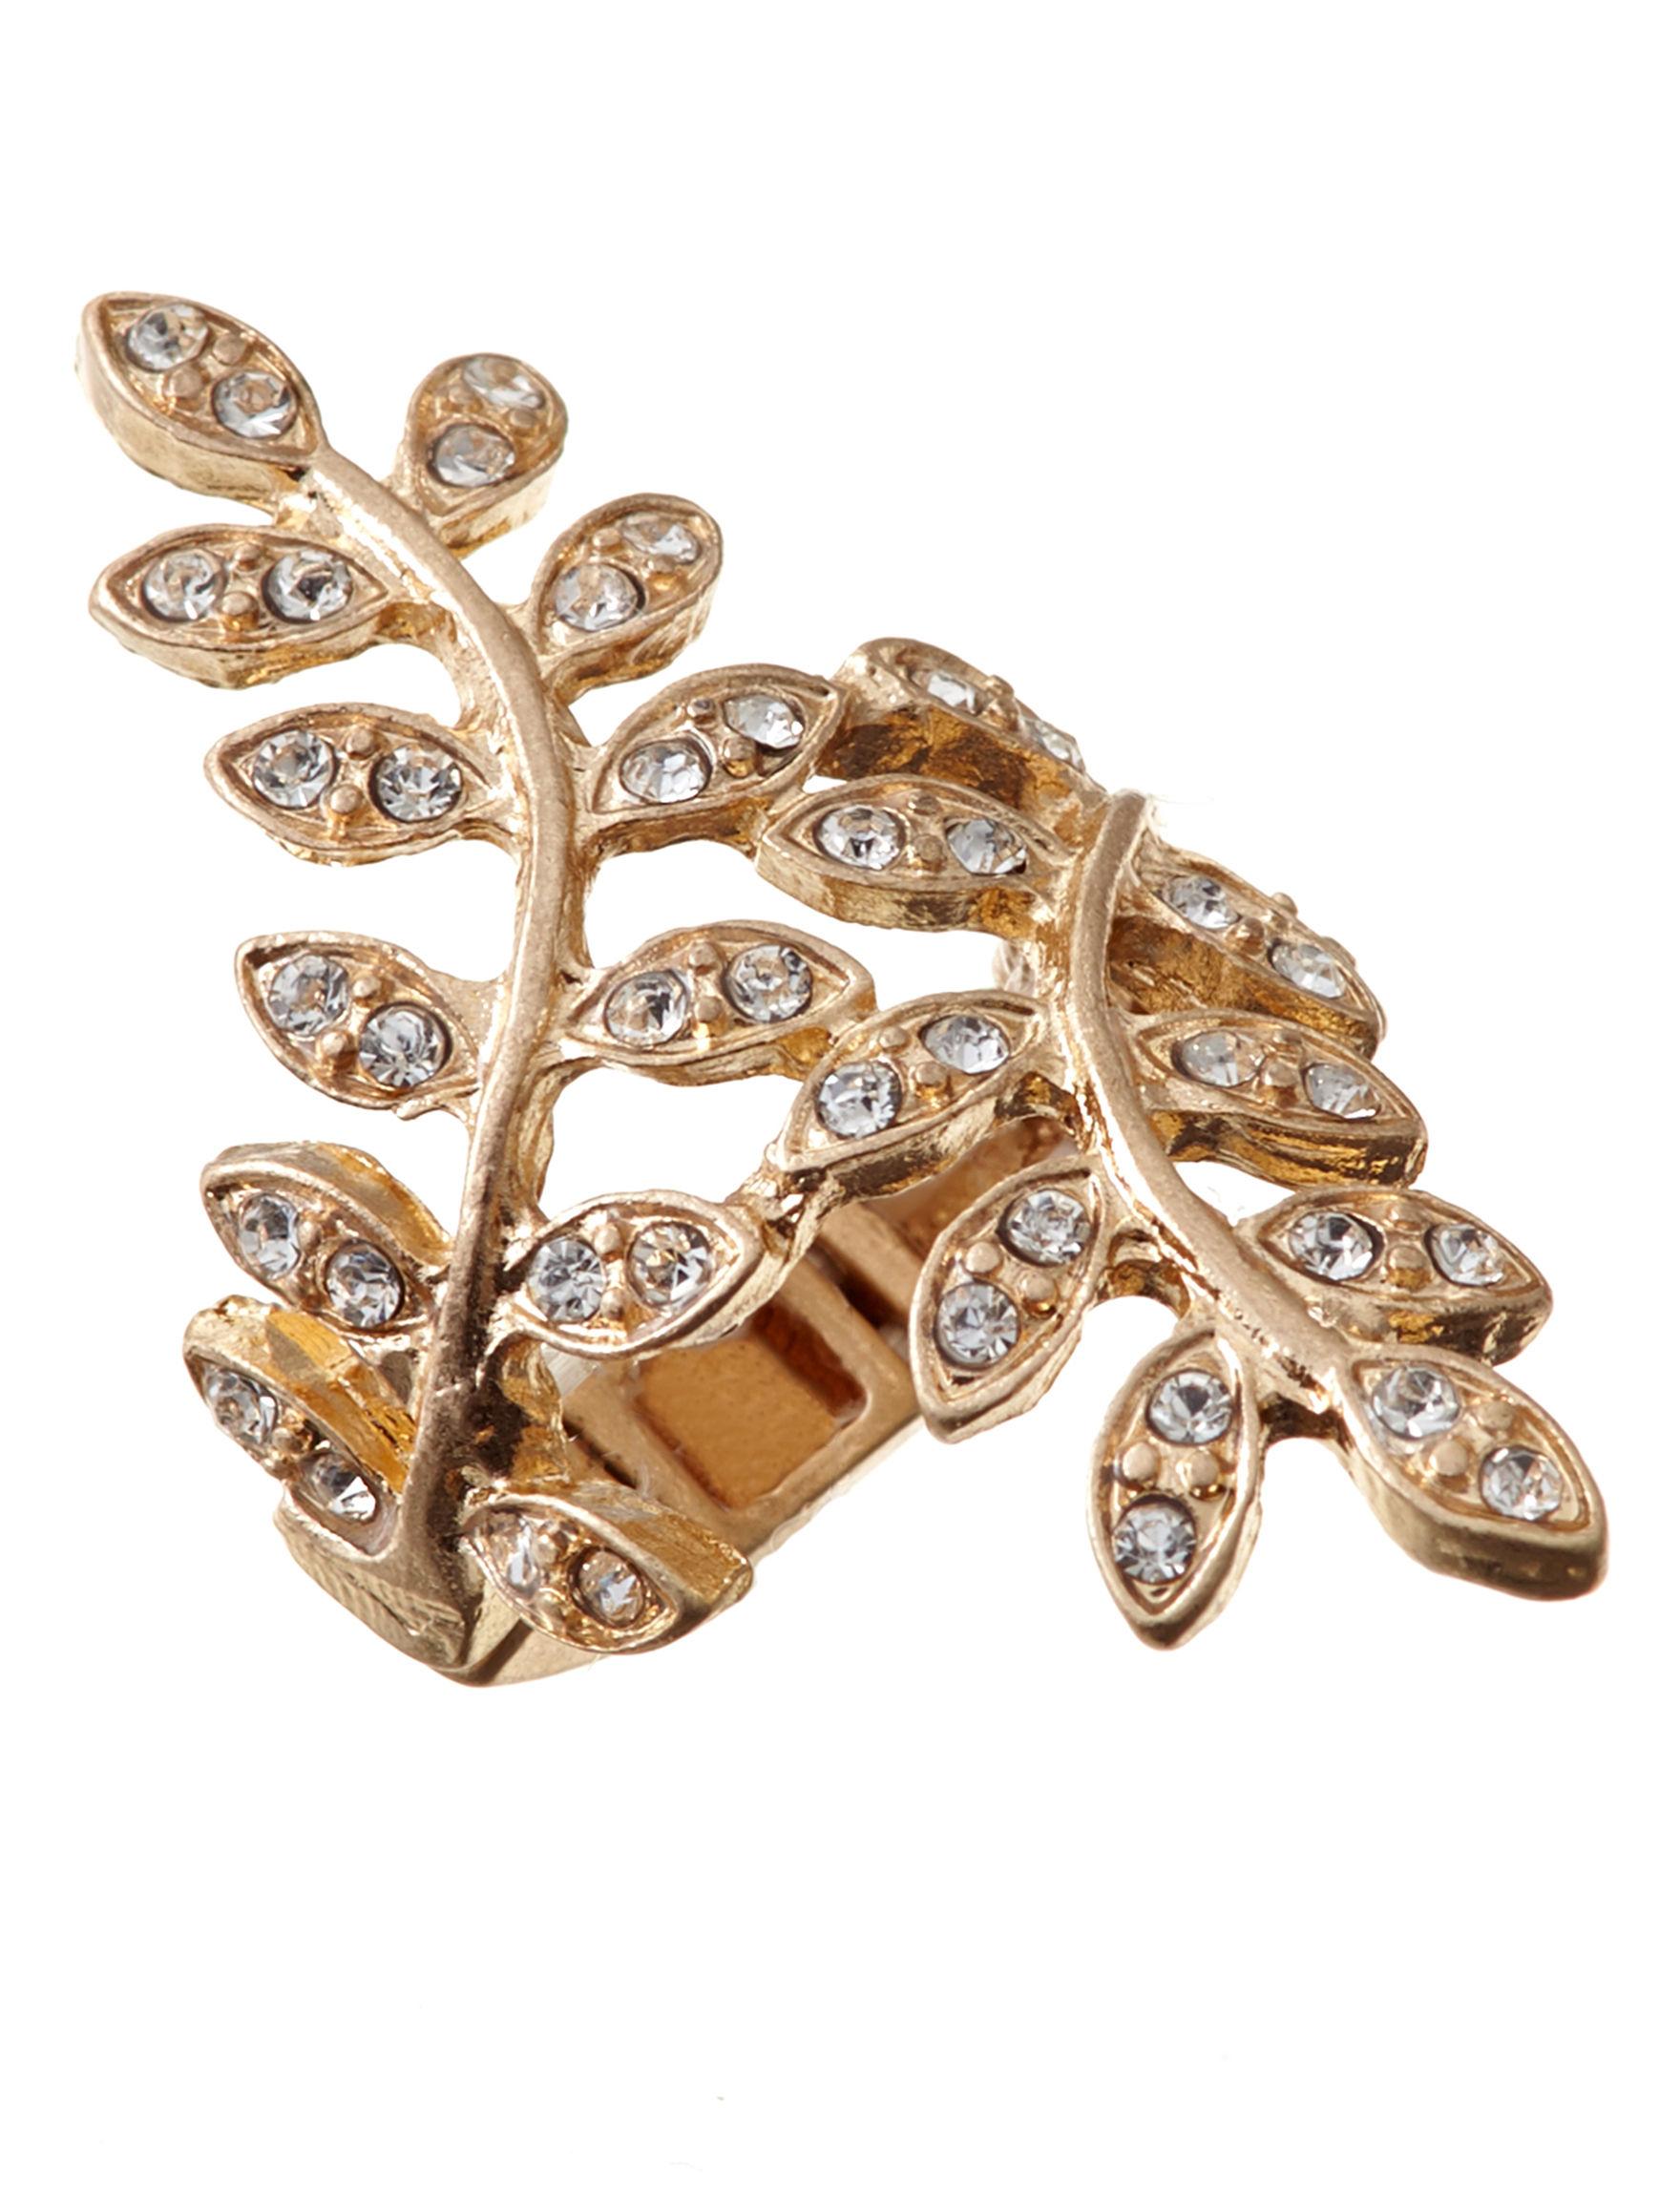 Signature Studio White Rings Fashion Jewelry